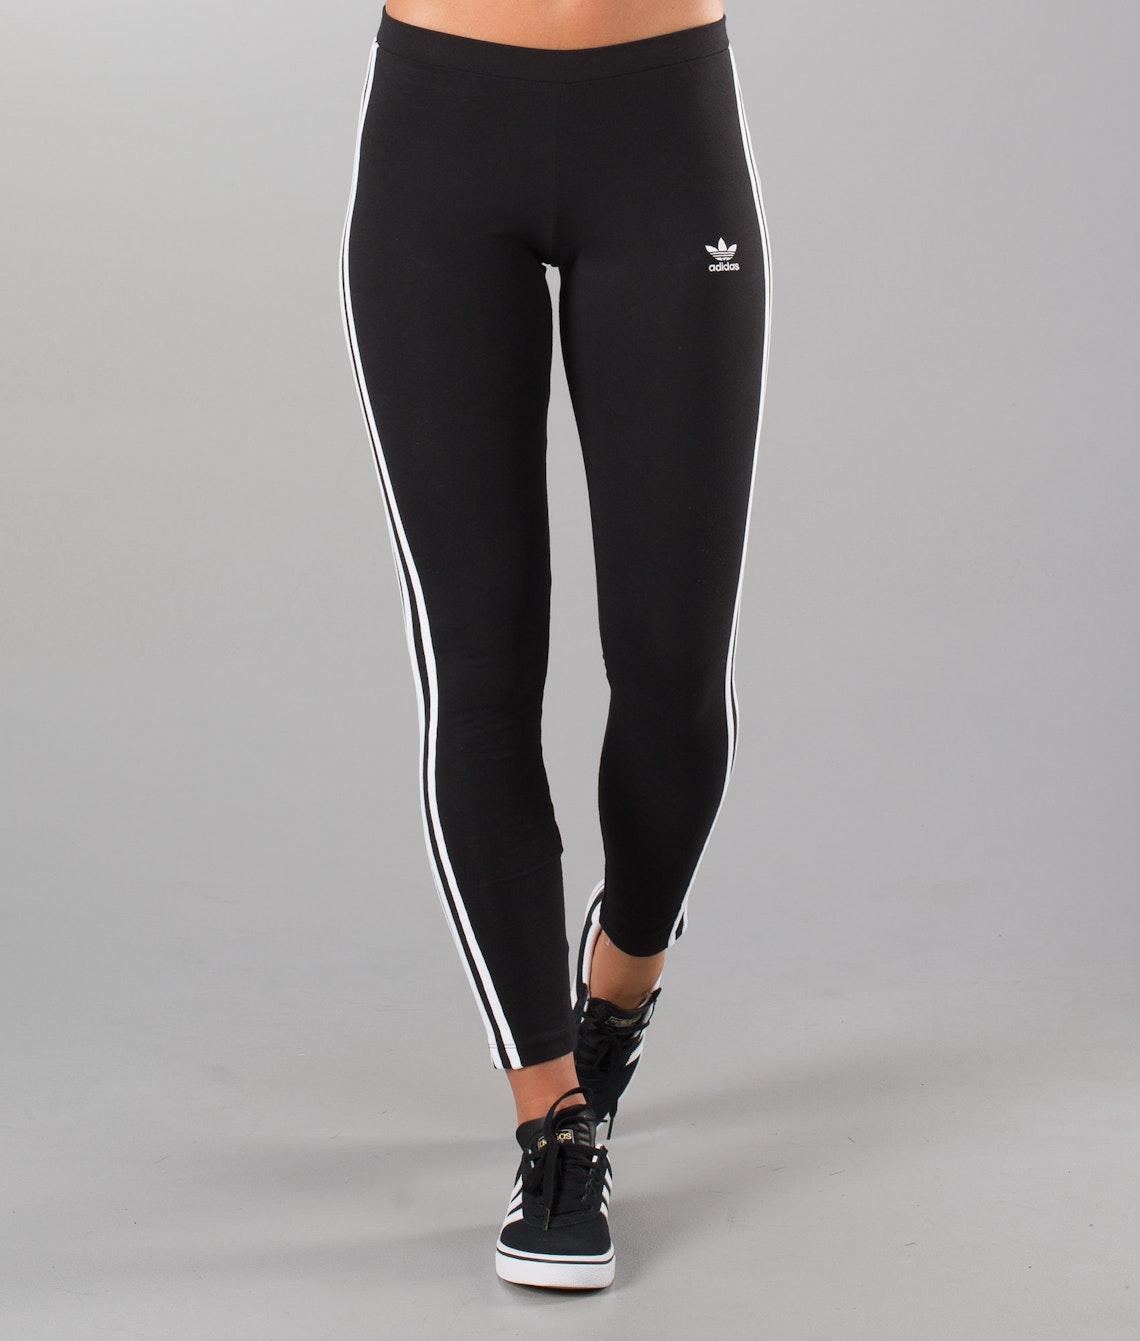 Legging Adidas 3 Stripes 7